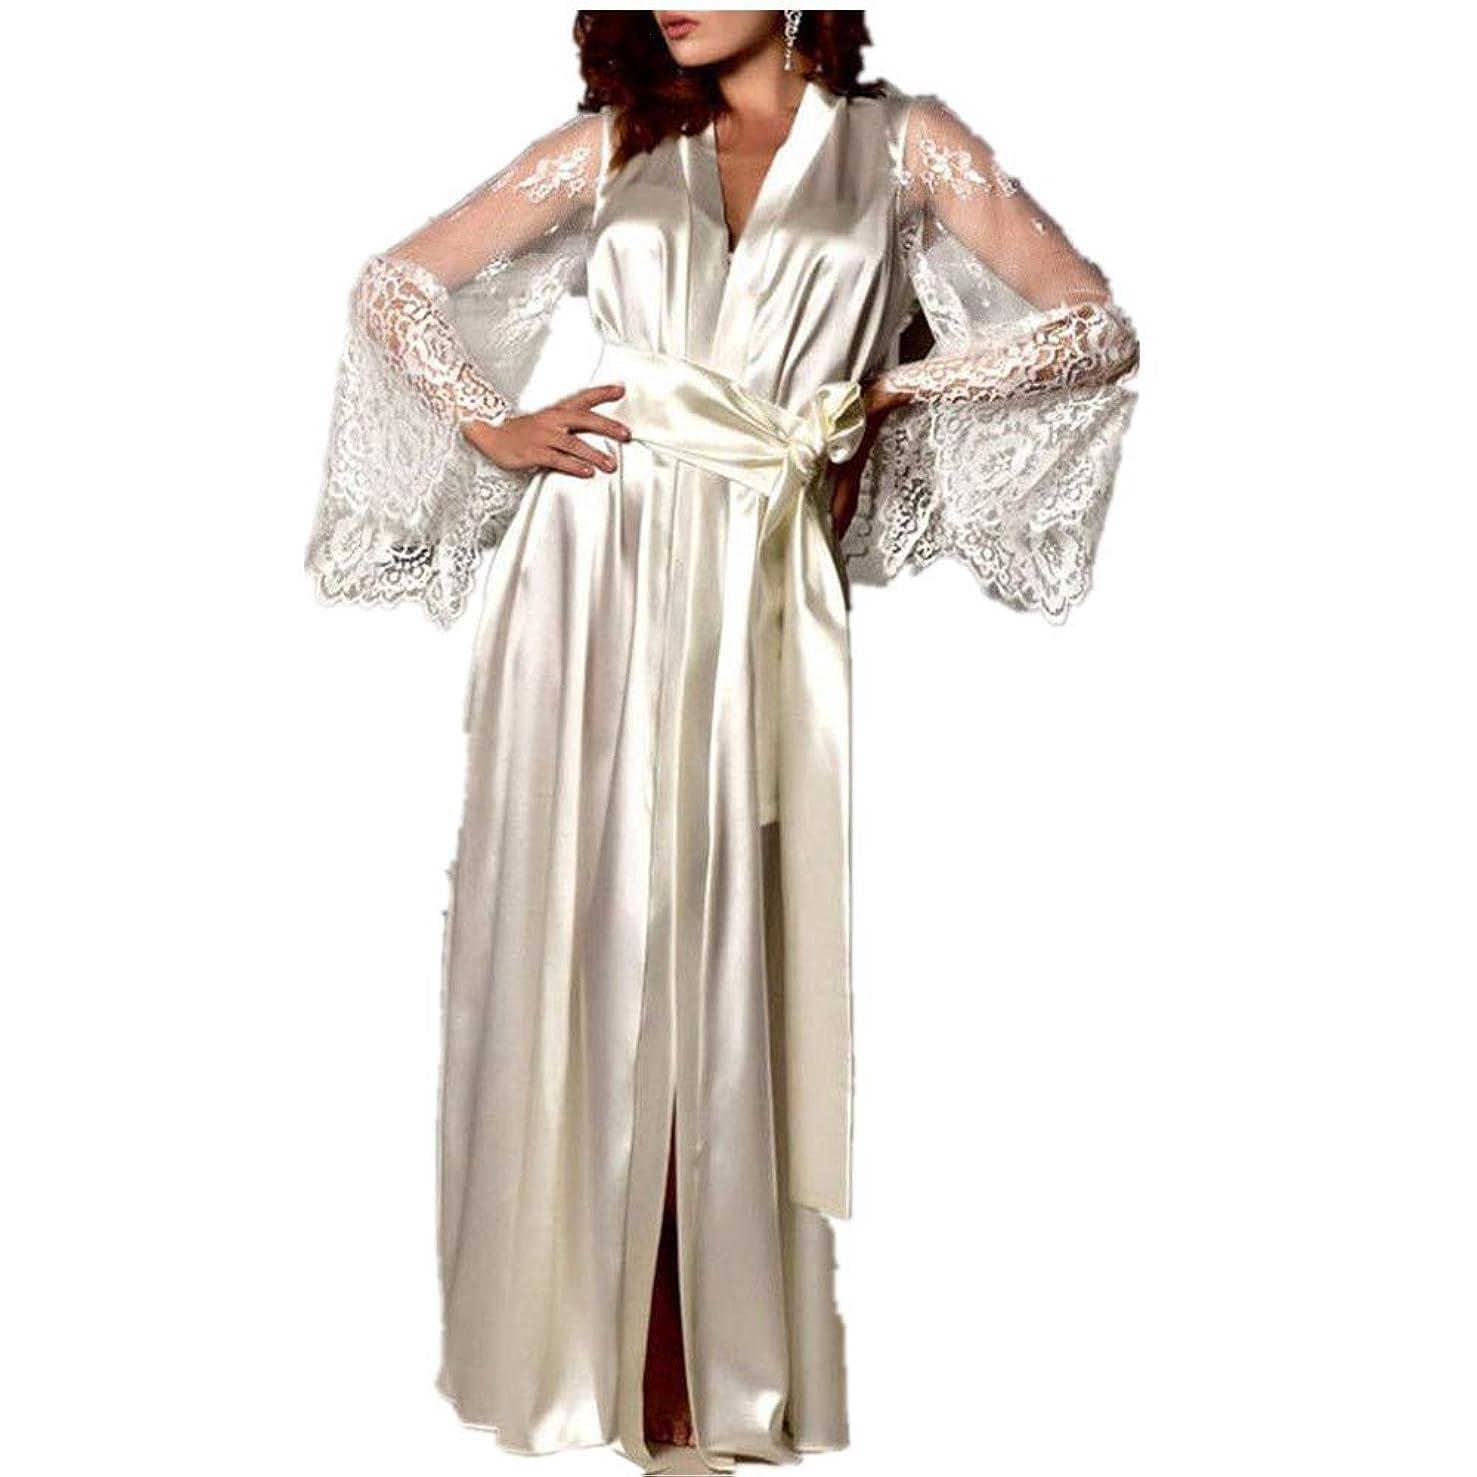 Women's Satin Pajamas Long Nightdress Lace Patchwork Nightgown Sleepwear Sexy Robe